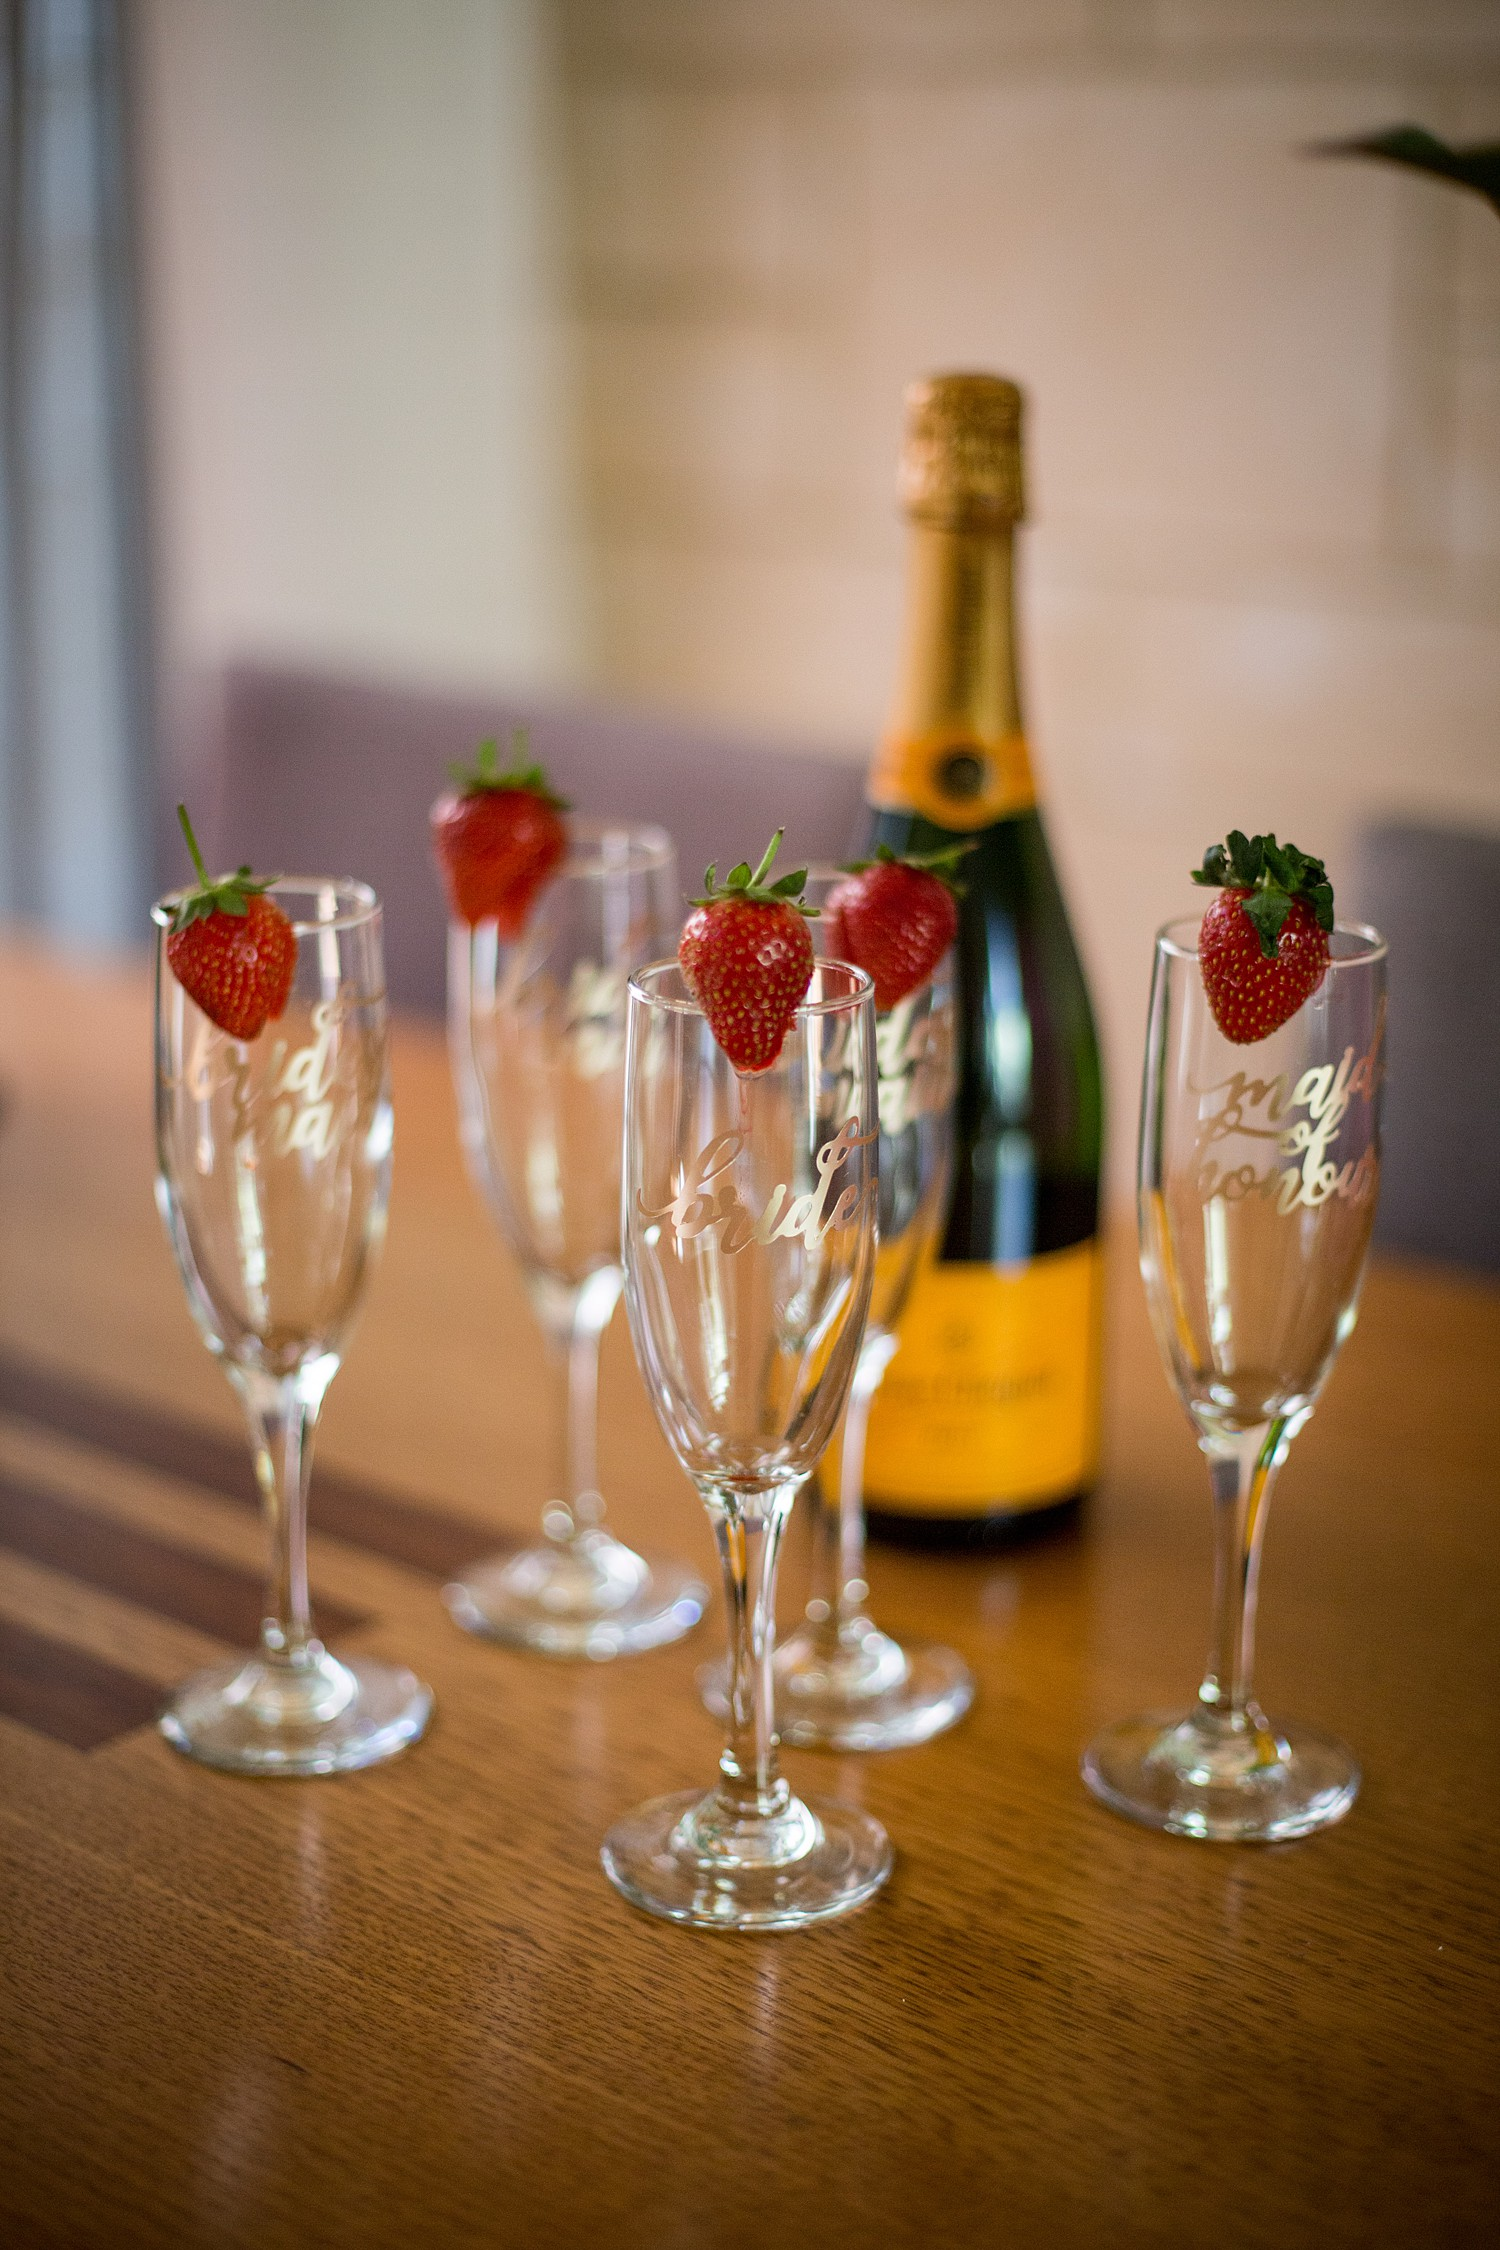 wise_wines_southwest_WA_wedding_0005.jpg